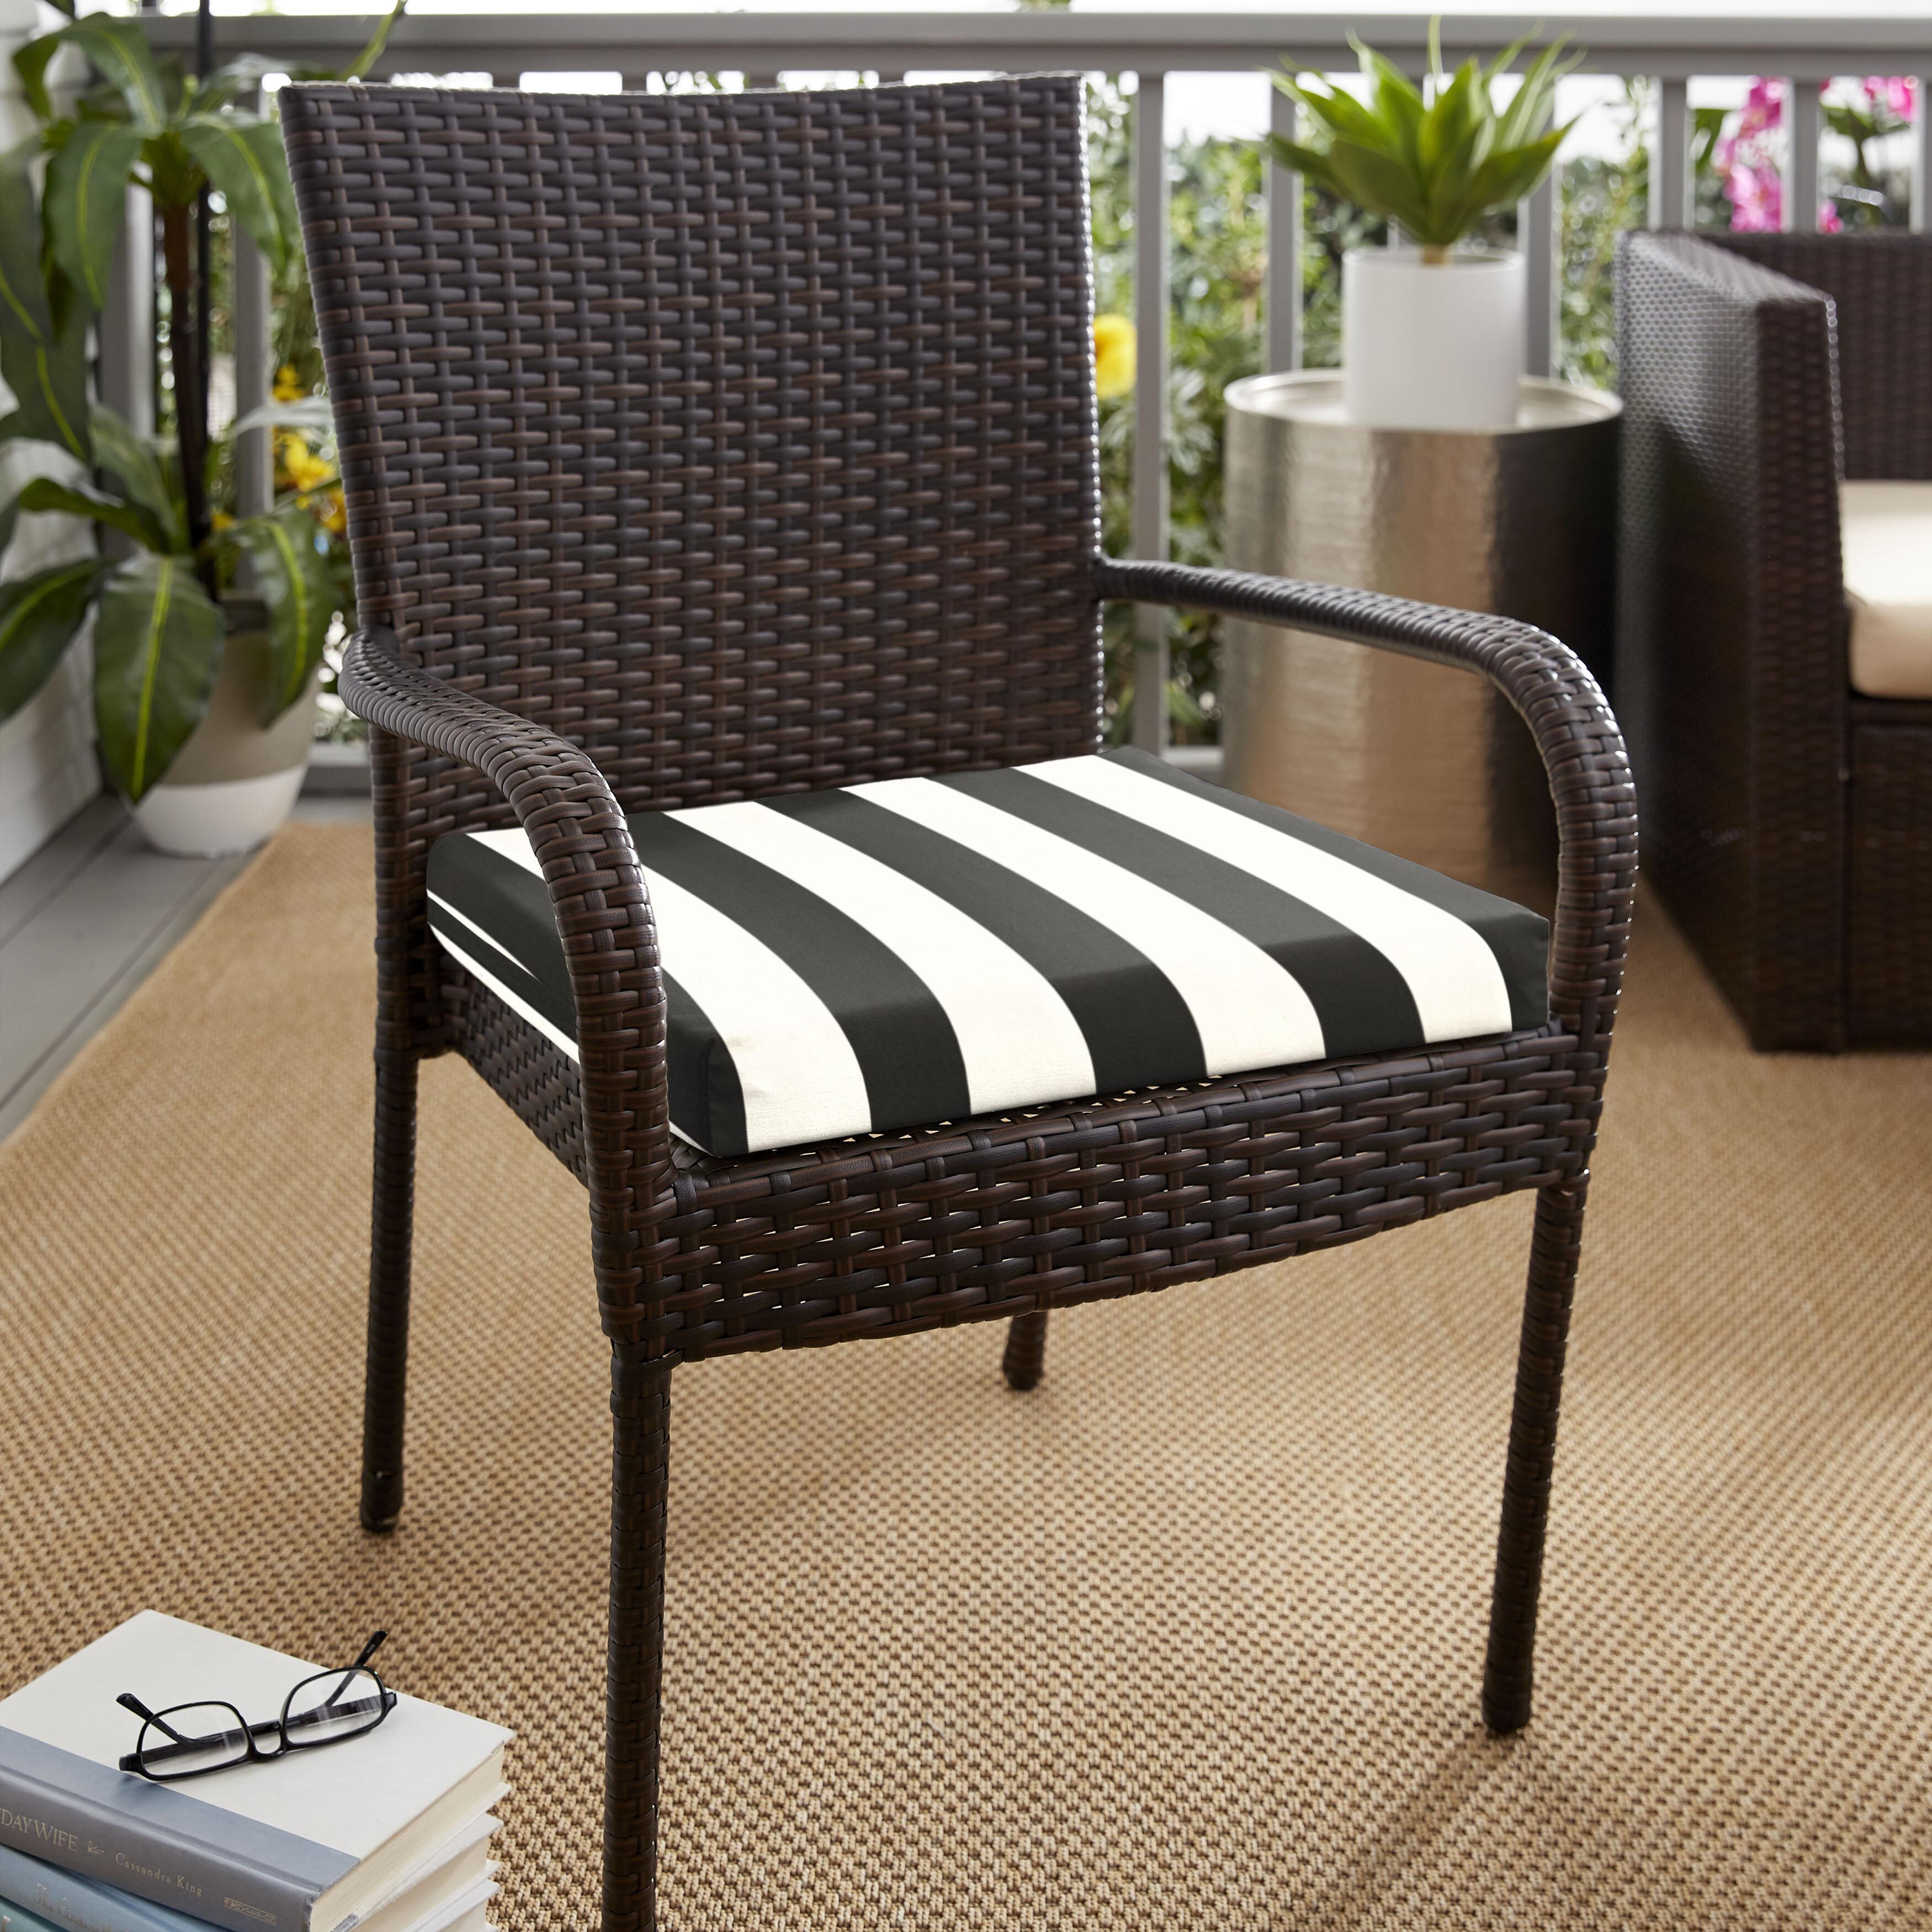 Brayden Studio Kallisto Classic Indoor Outdoor Sunbrella Dining Chair Cushion Wayfair